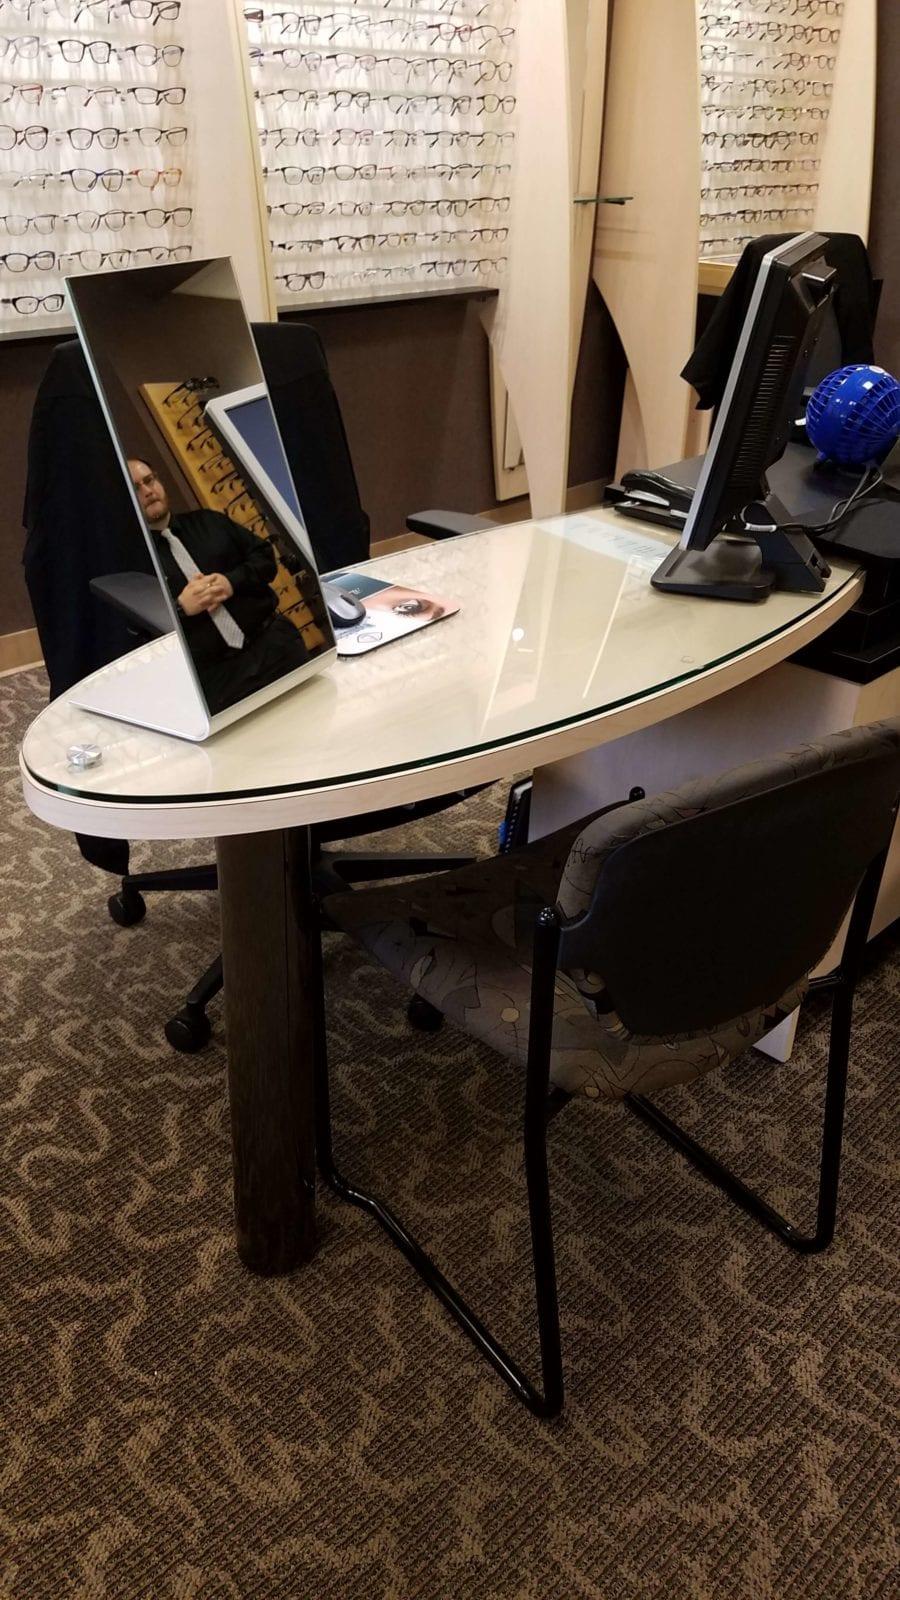 eye designs optical displays reception desk reception chairs